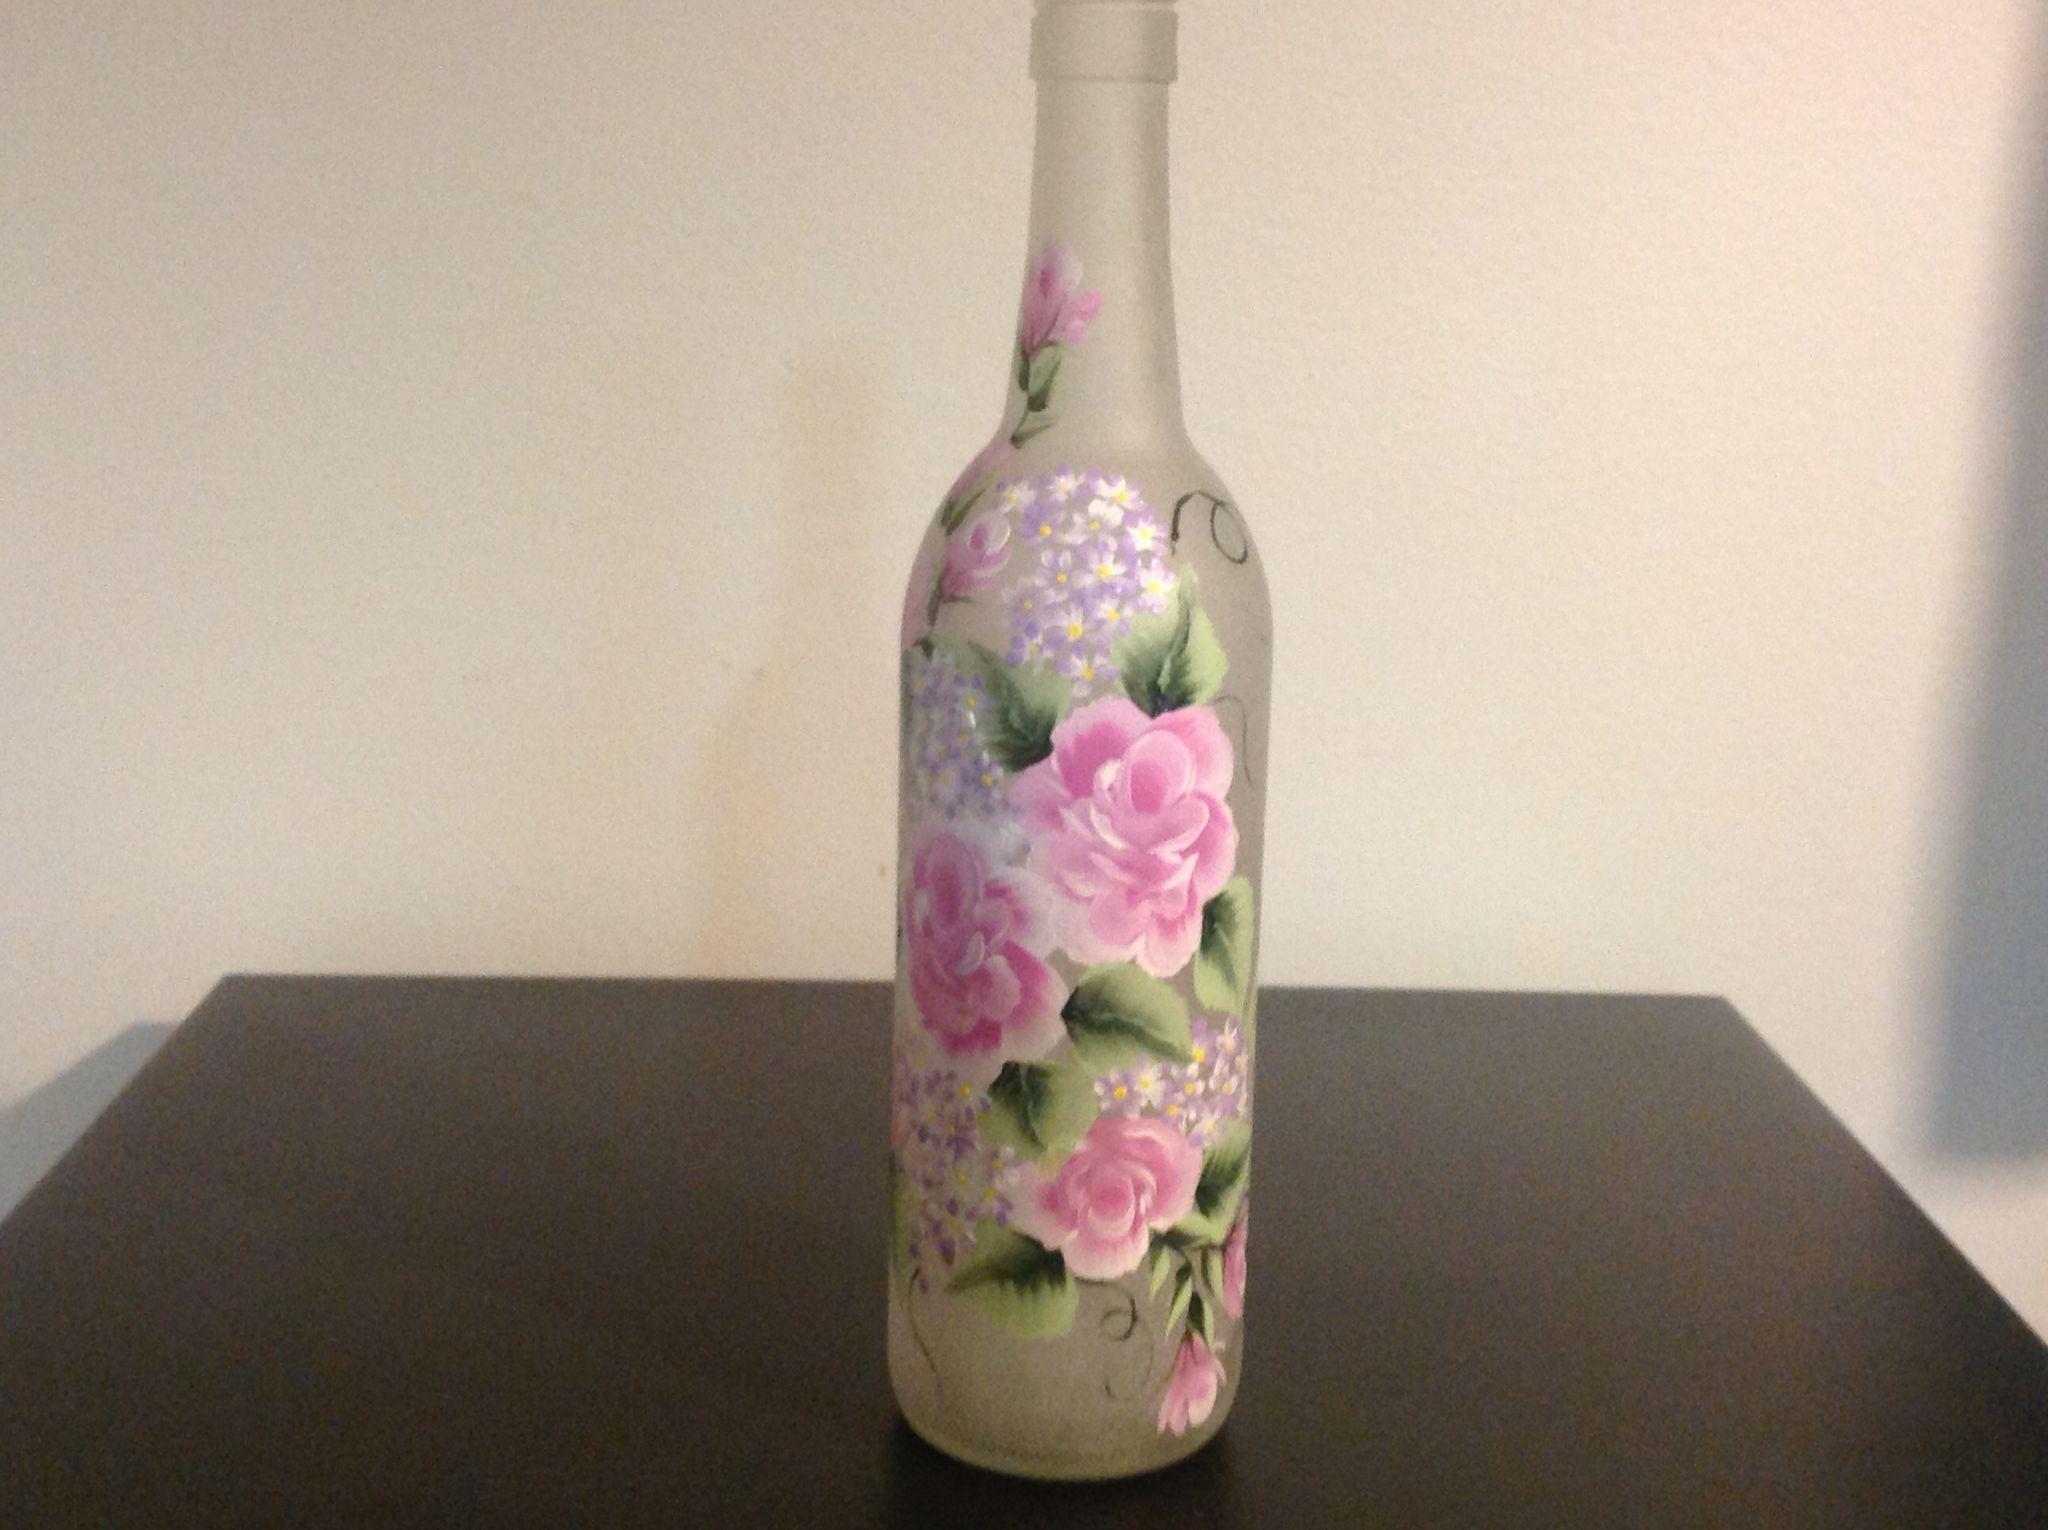 Pink roses lighted wine bottle